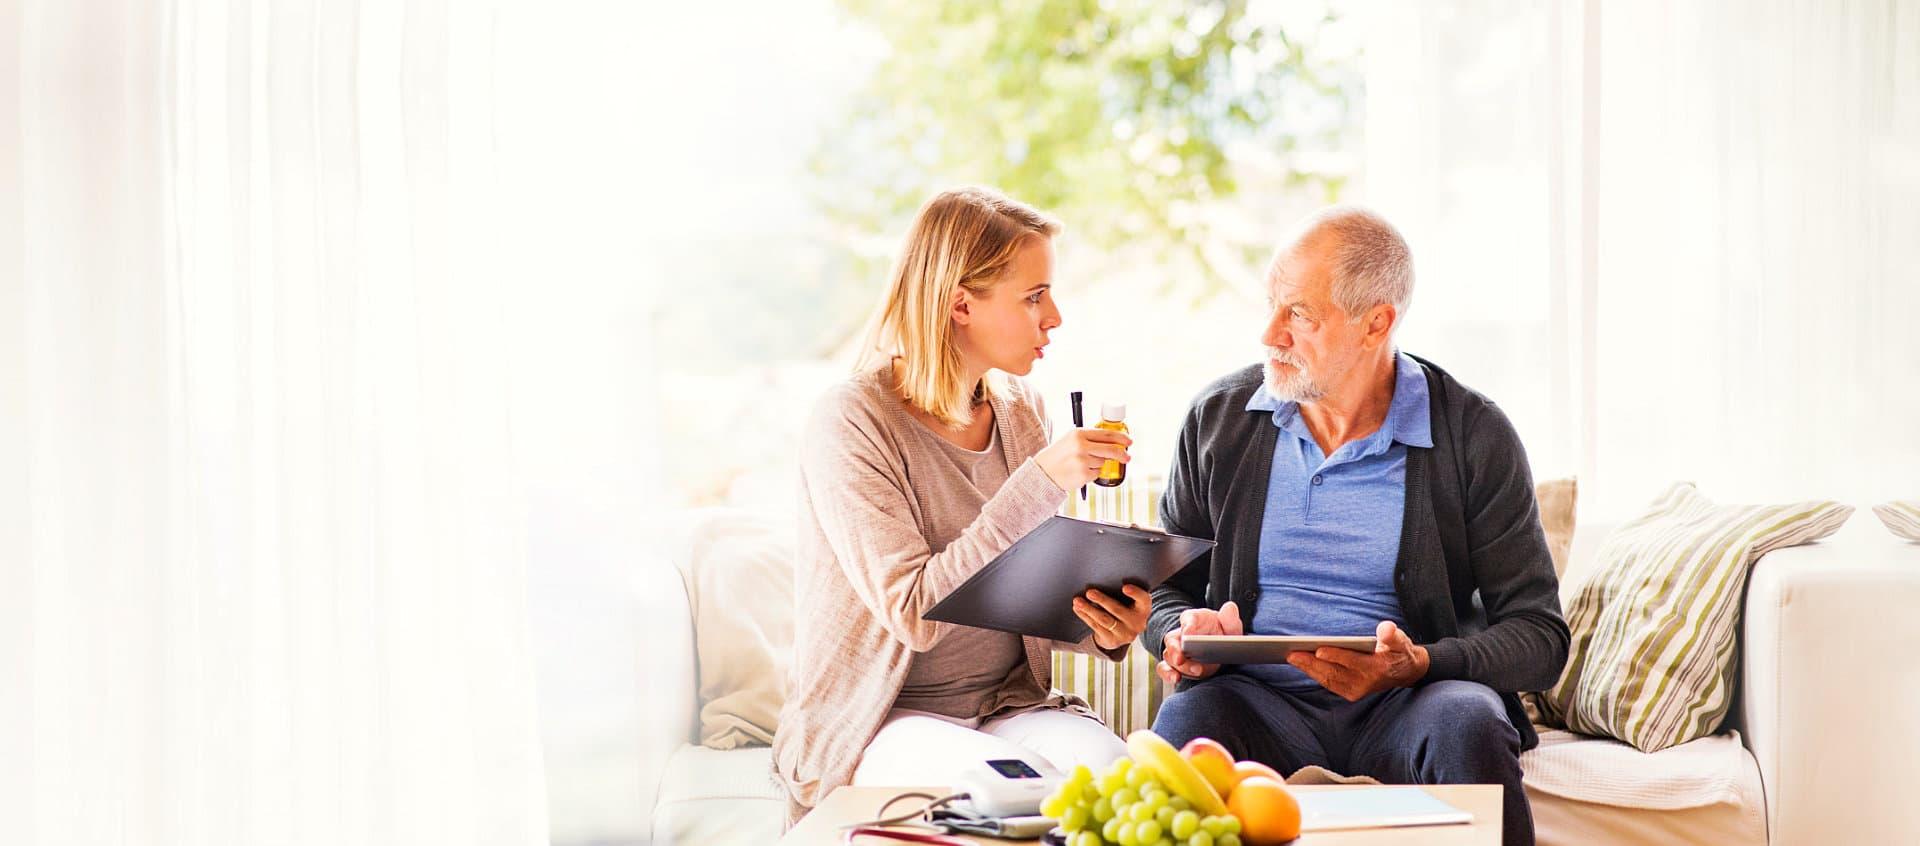 caregiver giving medicine to patient